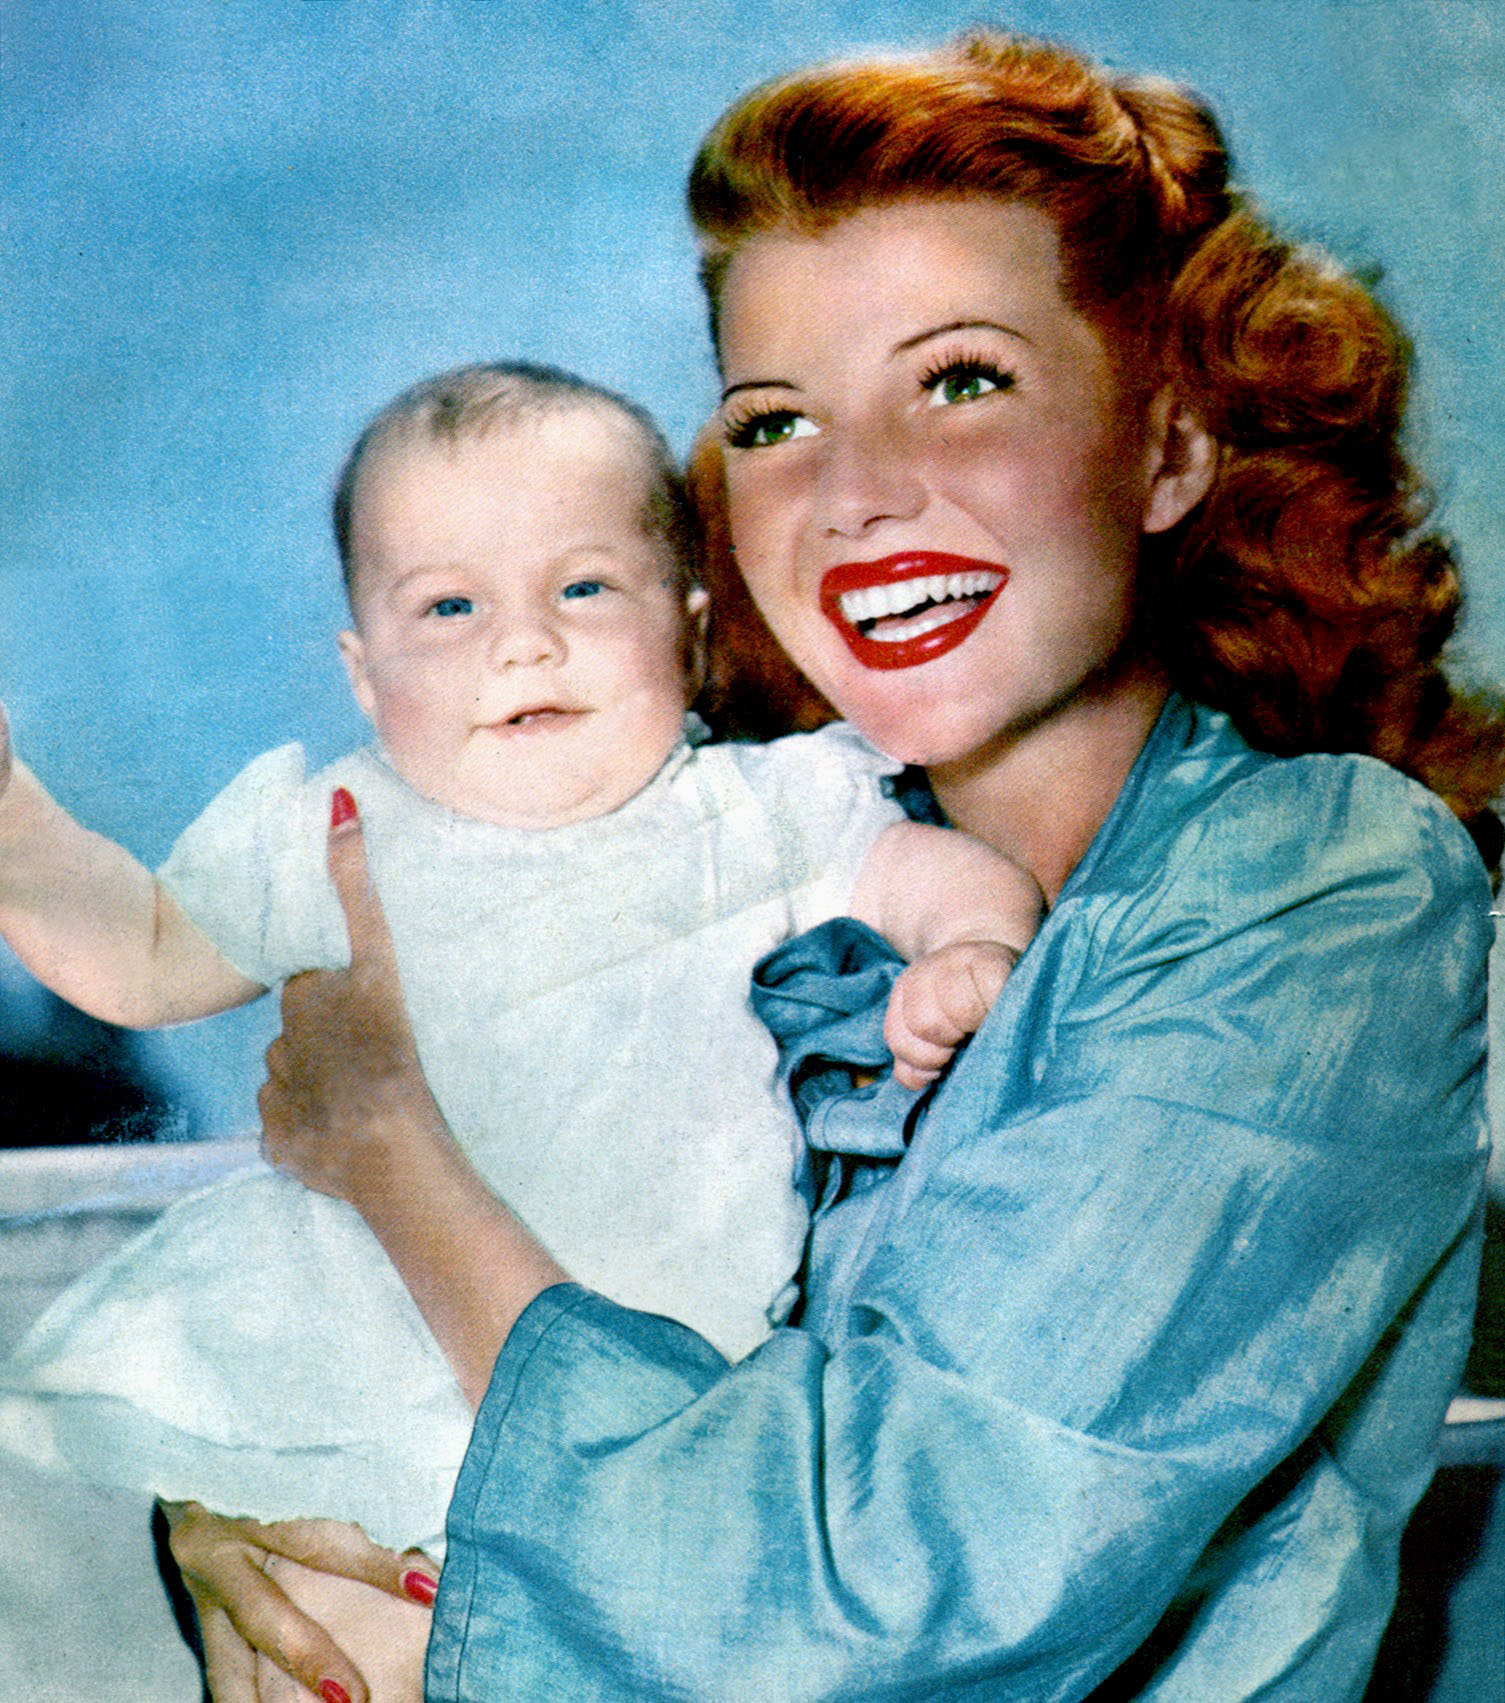 Rita with baby Rebecca